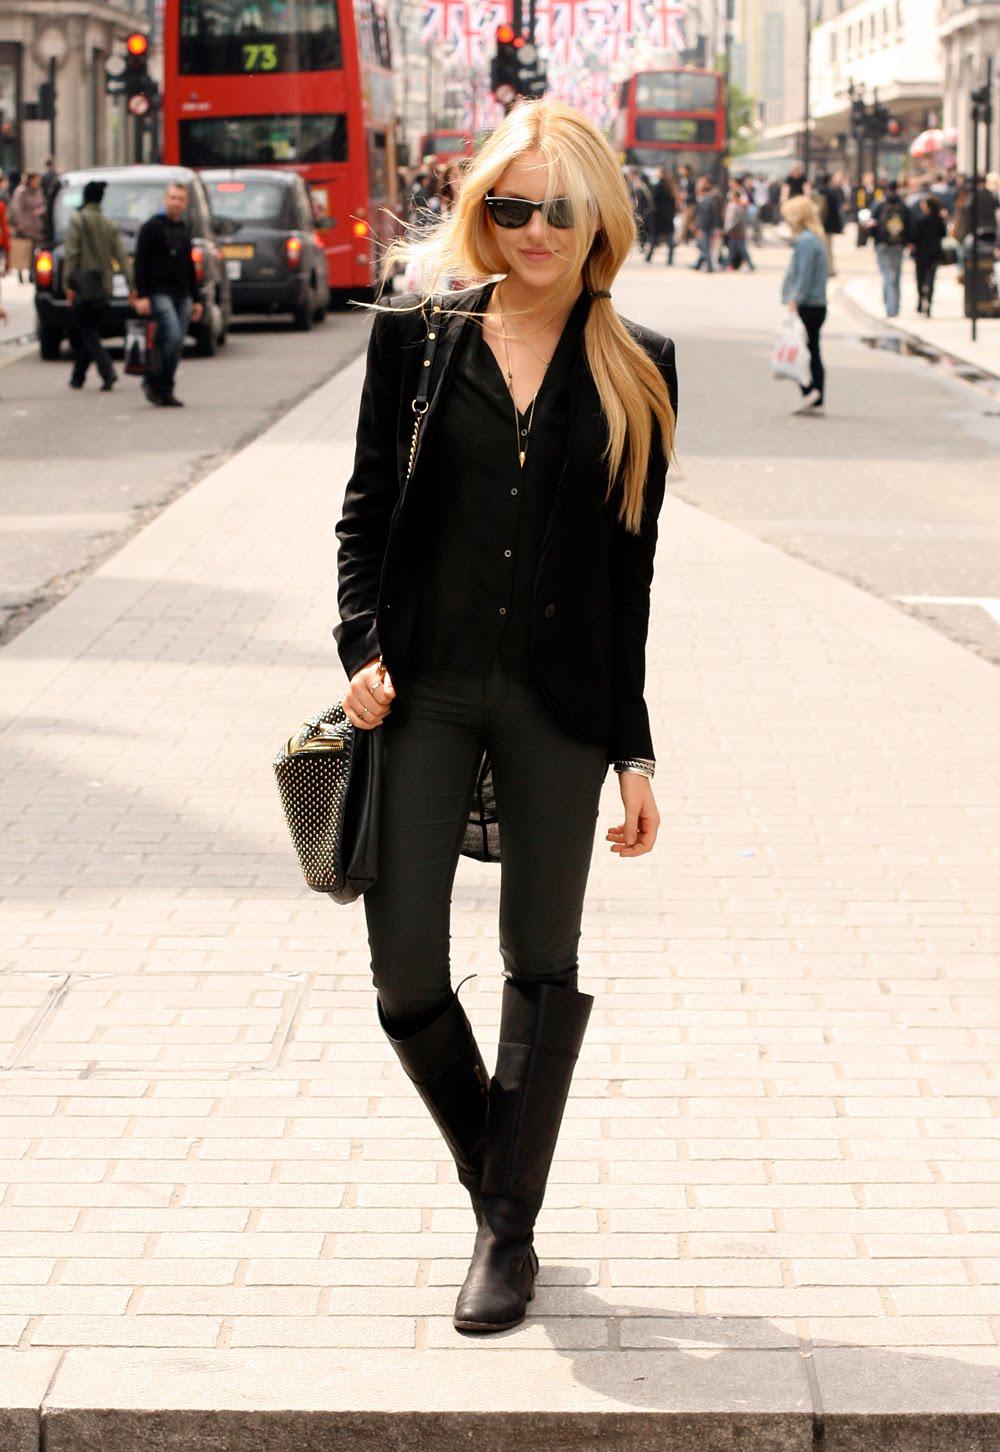 Сапоги к узким джинсам